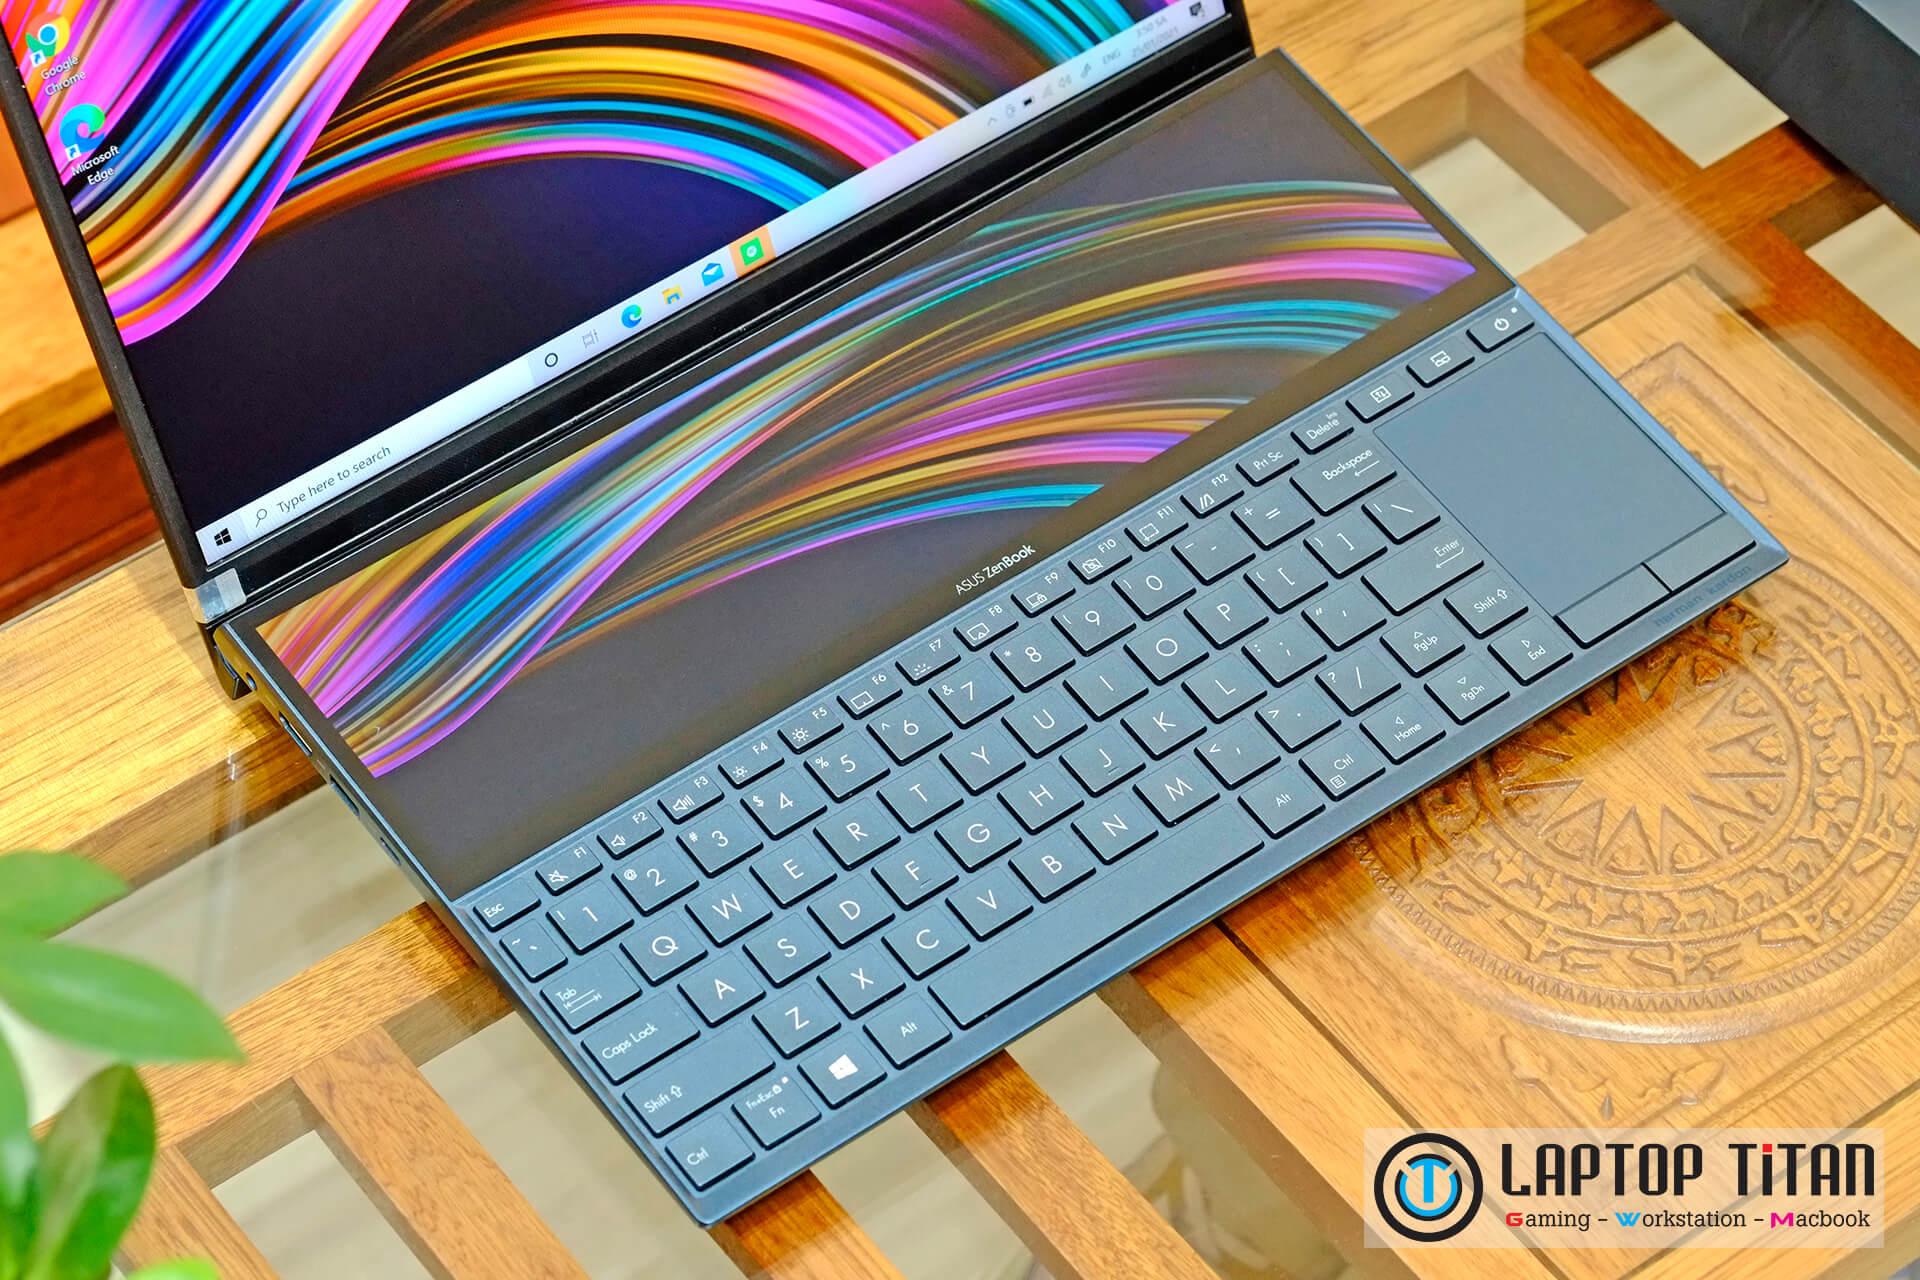 Asus Zenbook Duo Ux481Fl Laptoptitan 04